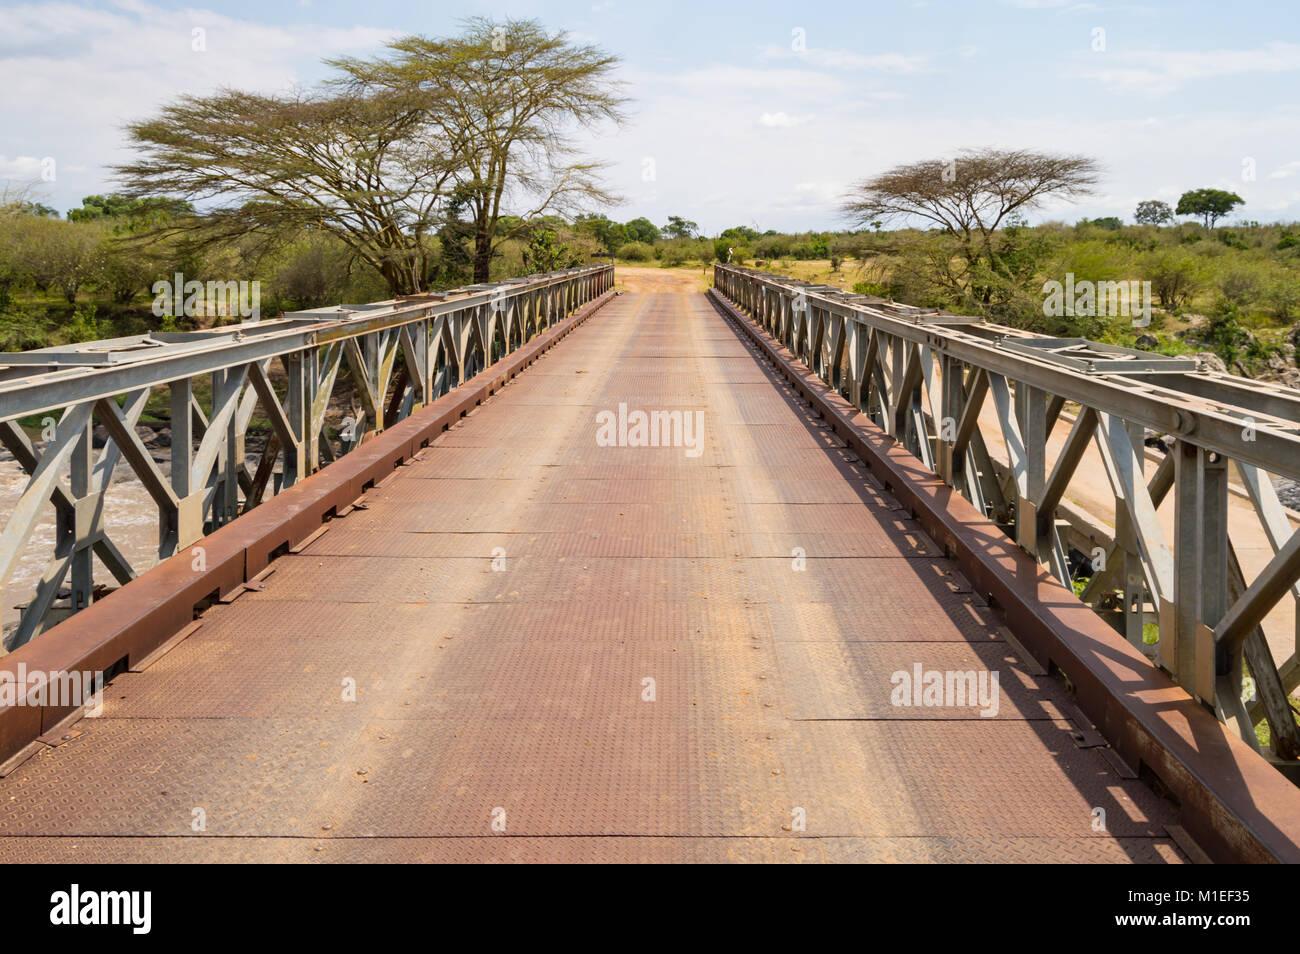 Iron Bridge on the Mara River between Maasai Mara Park in North West Kenya and Serenghetti Park in Tanzania - Stock Image